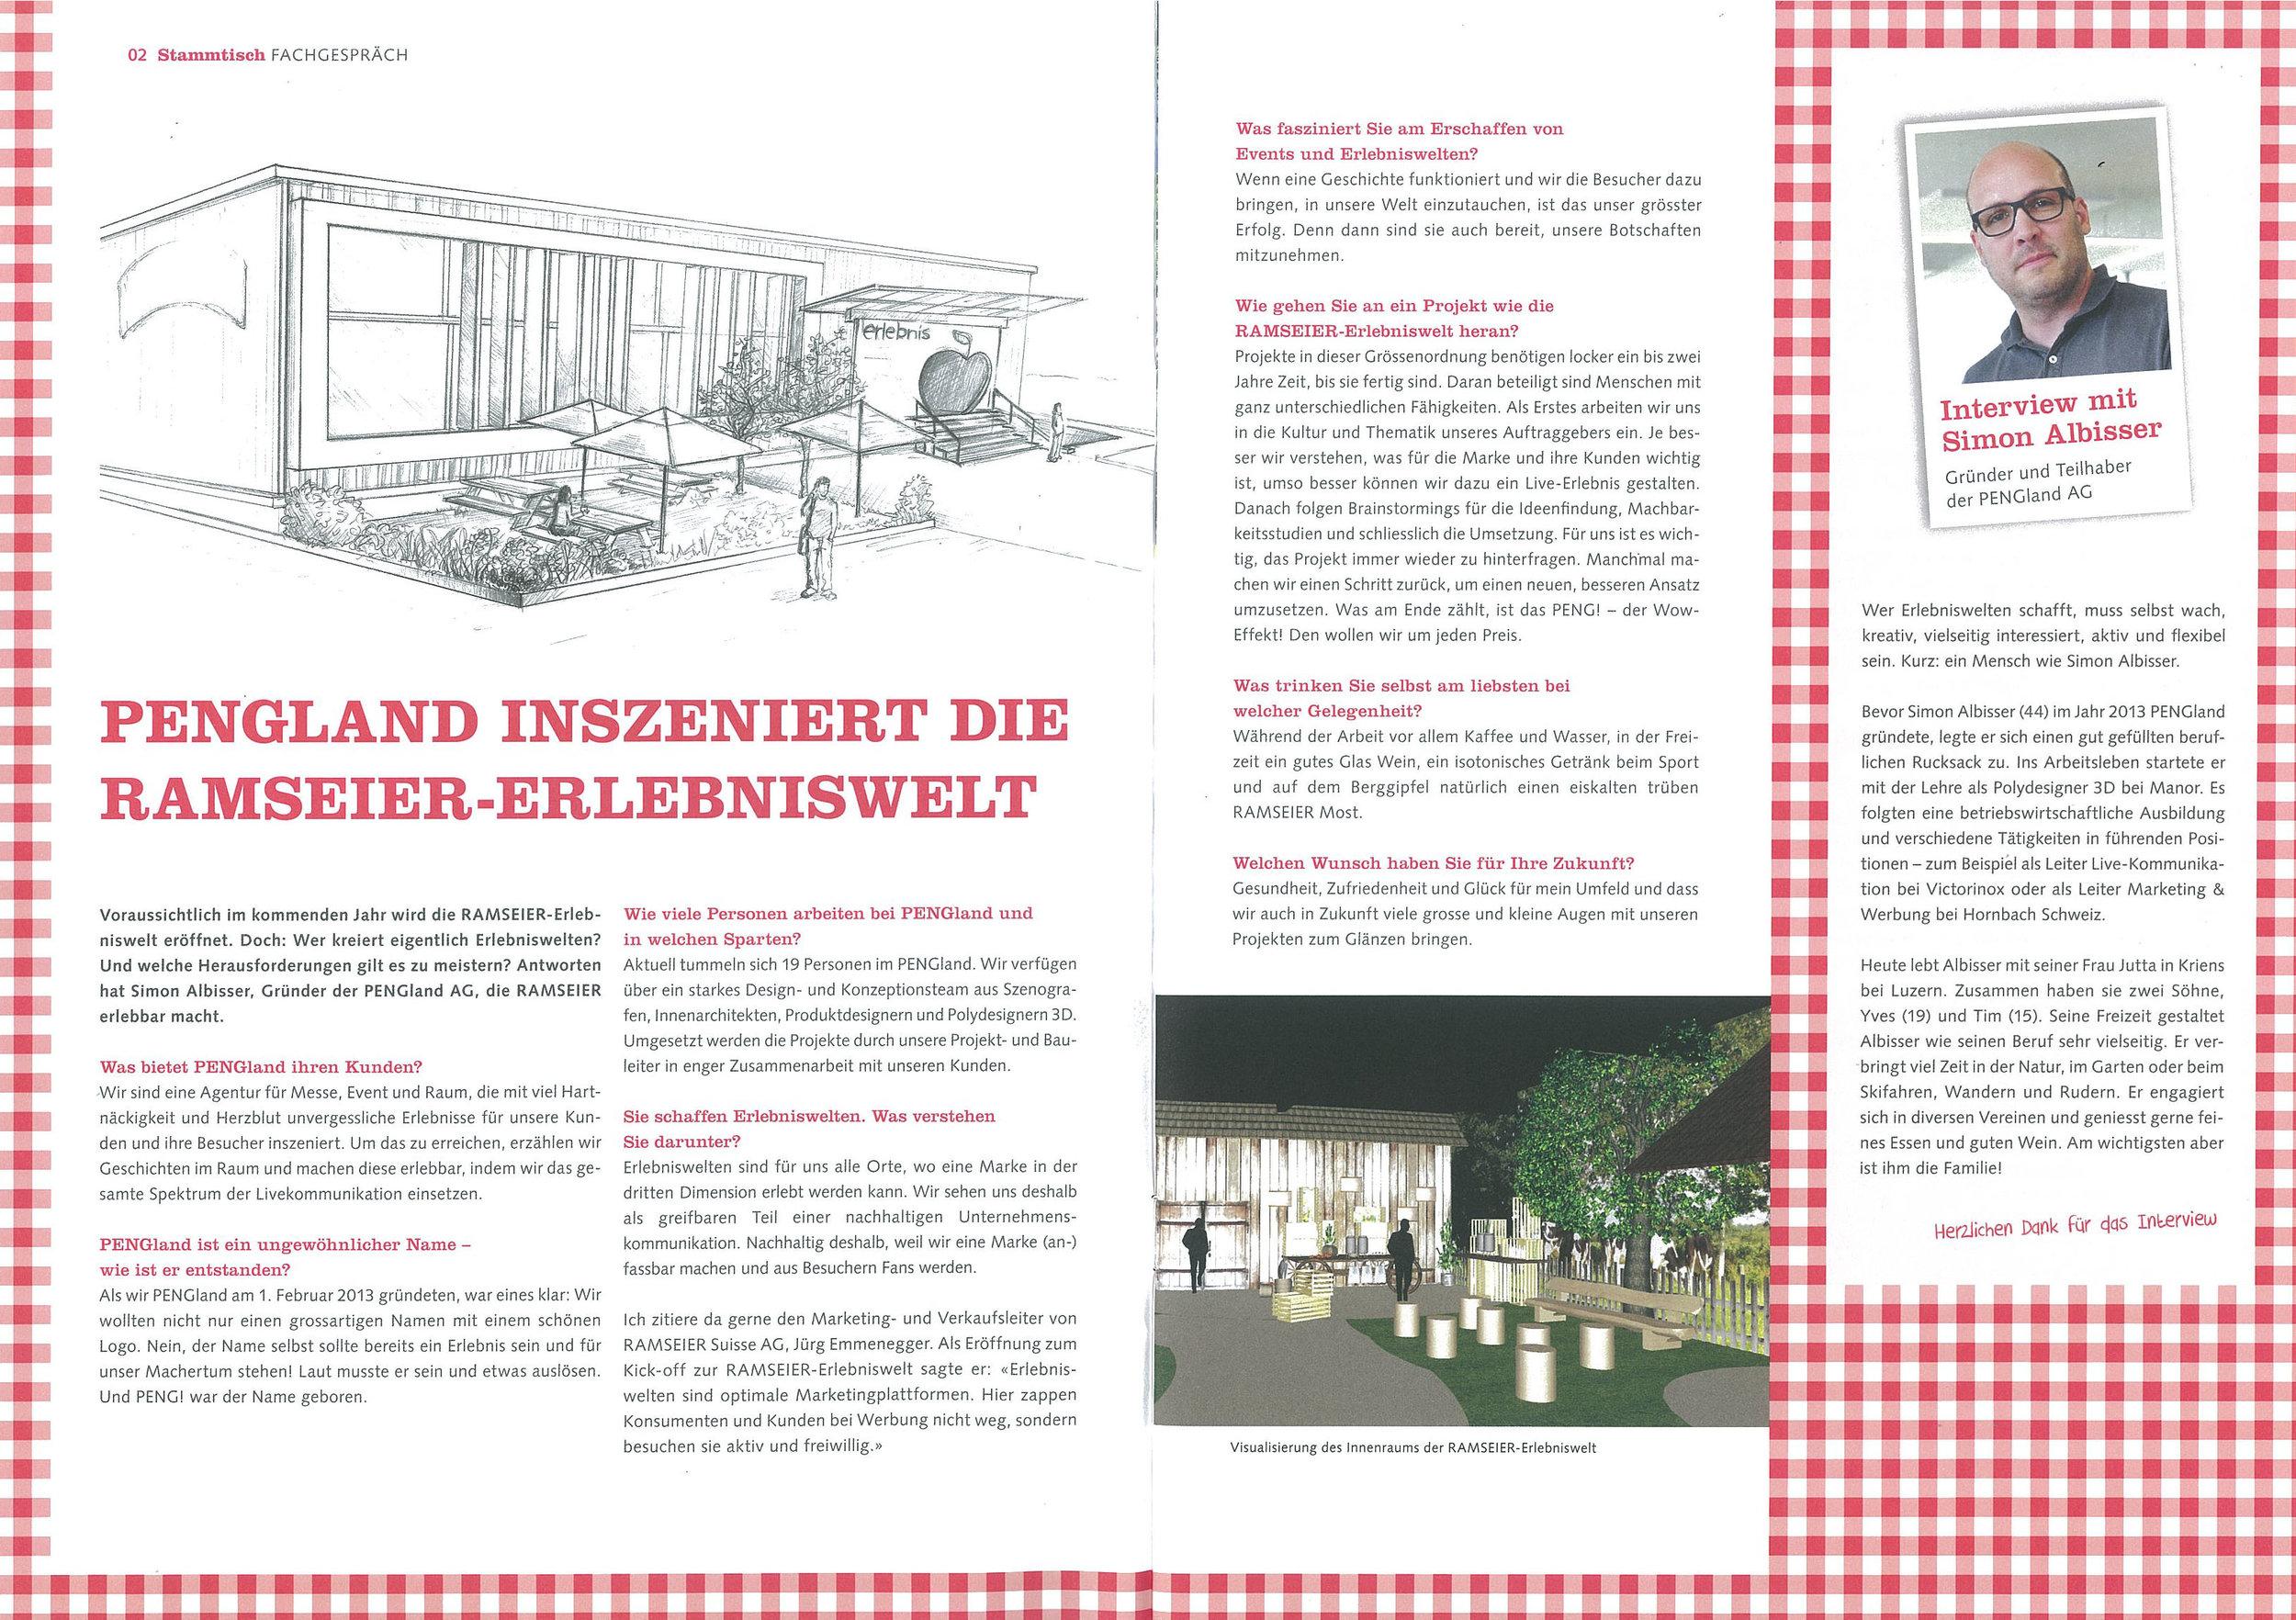 Ramseier Erlebniswelt Stammtisch Pengland August 2019.jpg